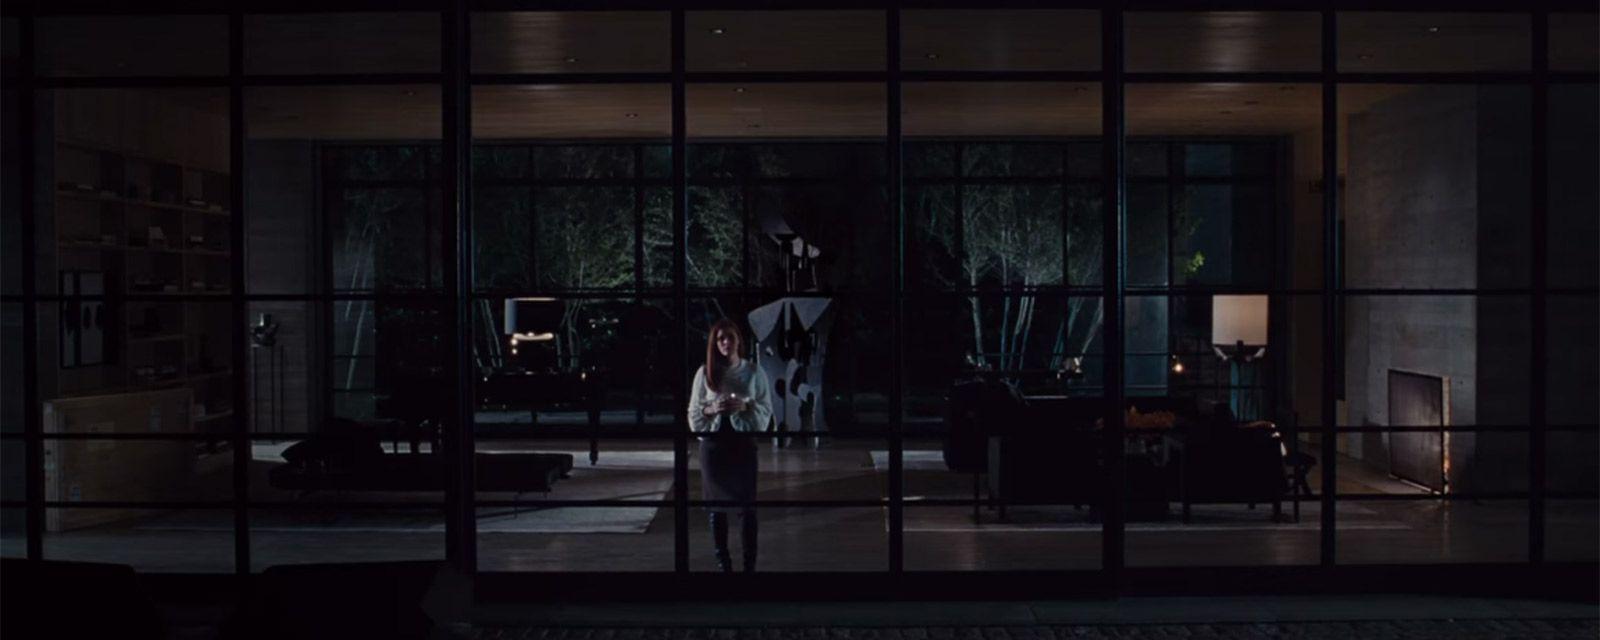 Deep Focus: Nocturnal Animals - Film Comment